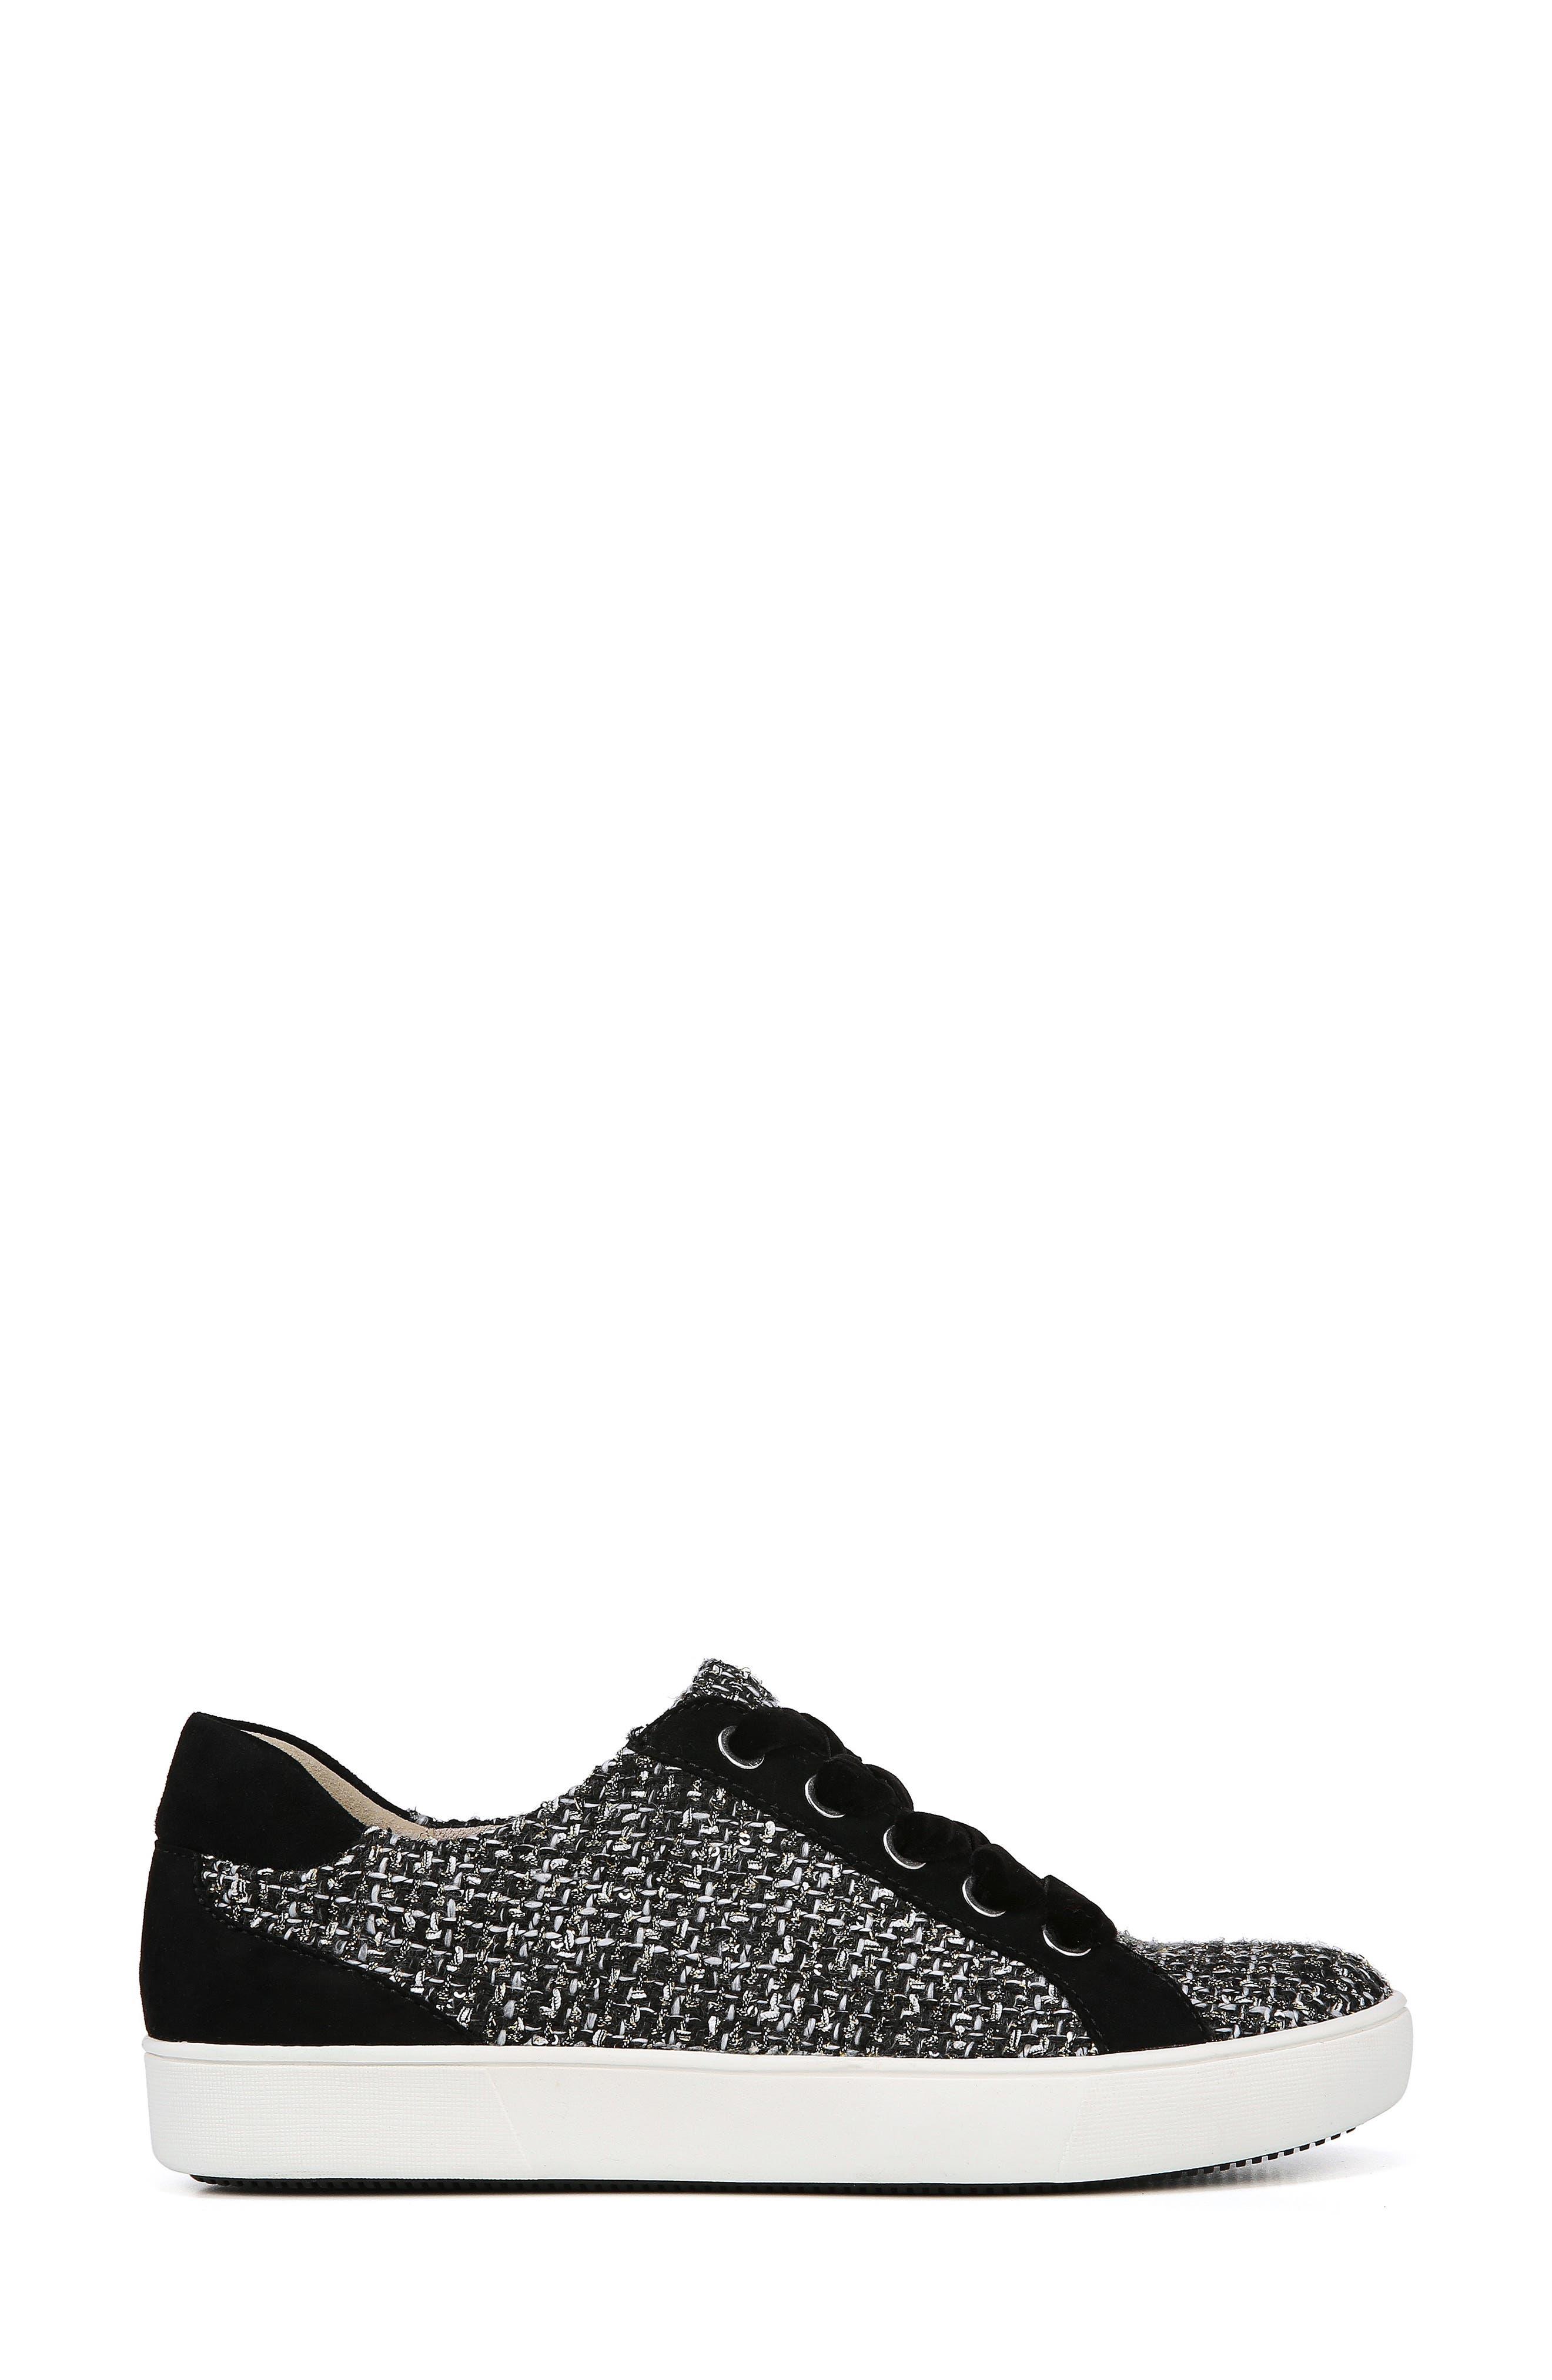 Morrison Sneaker,                             Alternate thumbnail 3, color,                             BLACK/ WHITE TWEED FABRIC